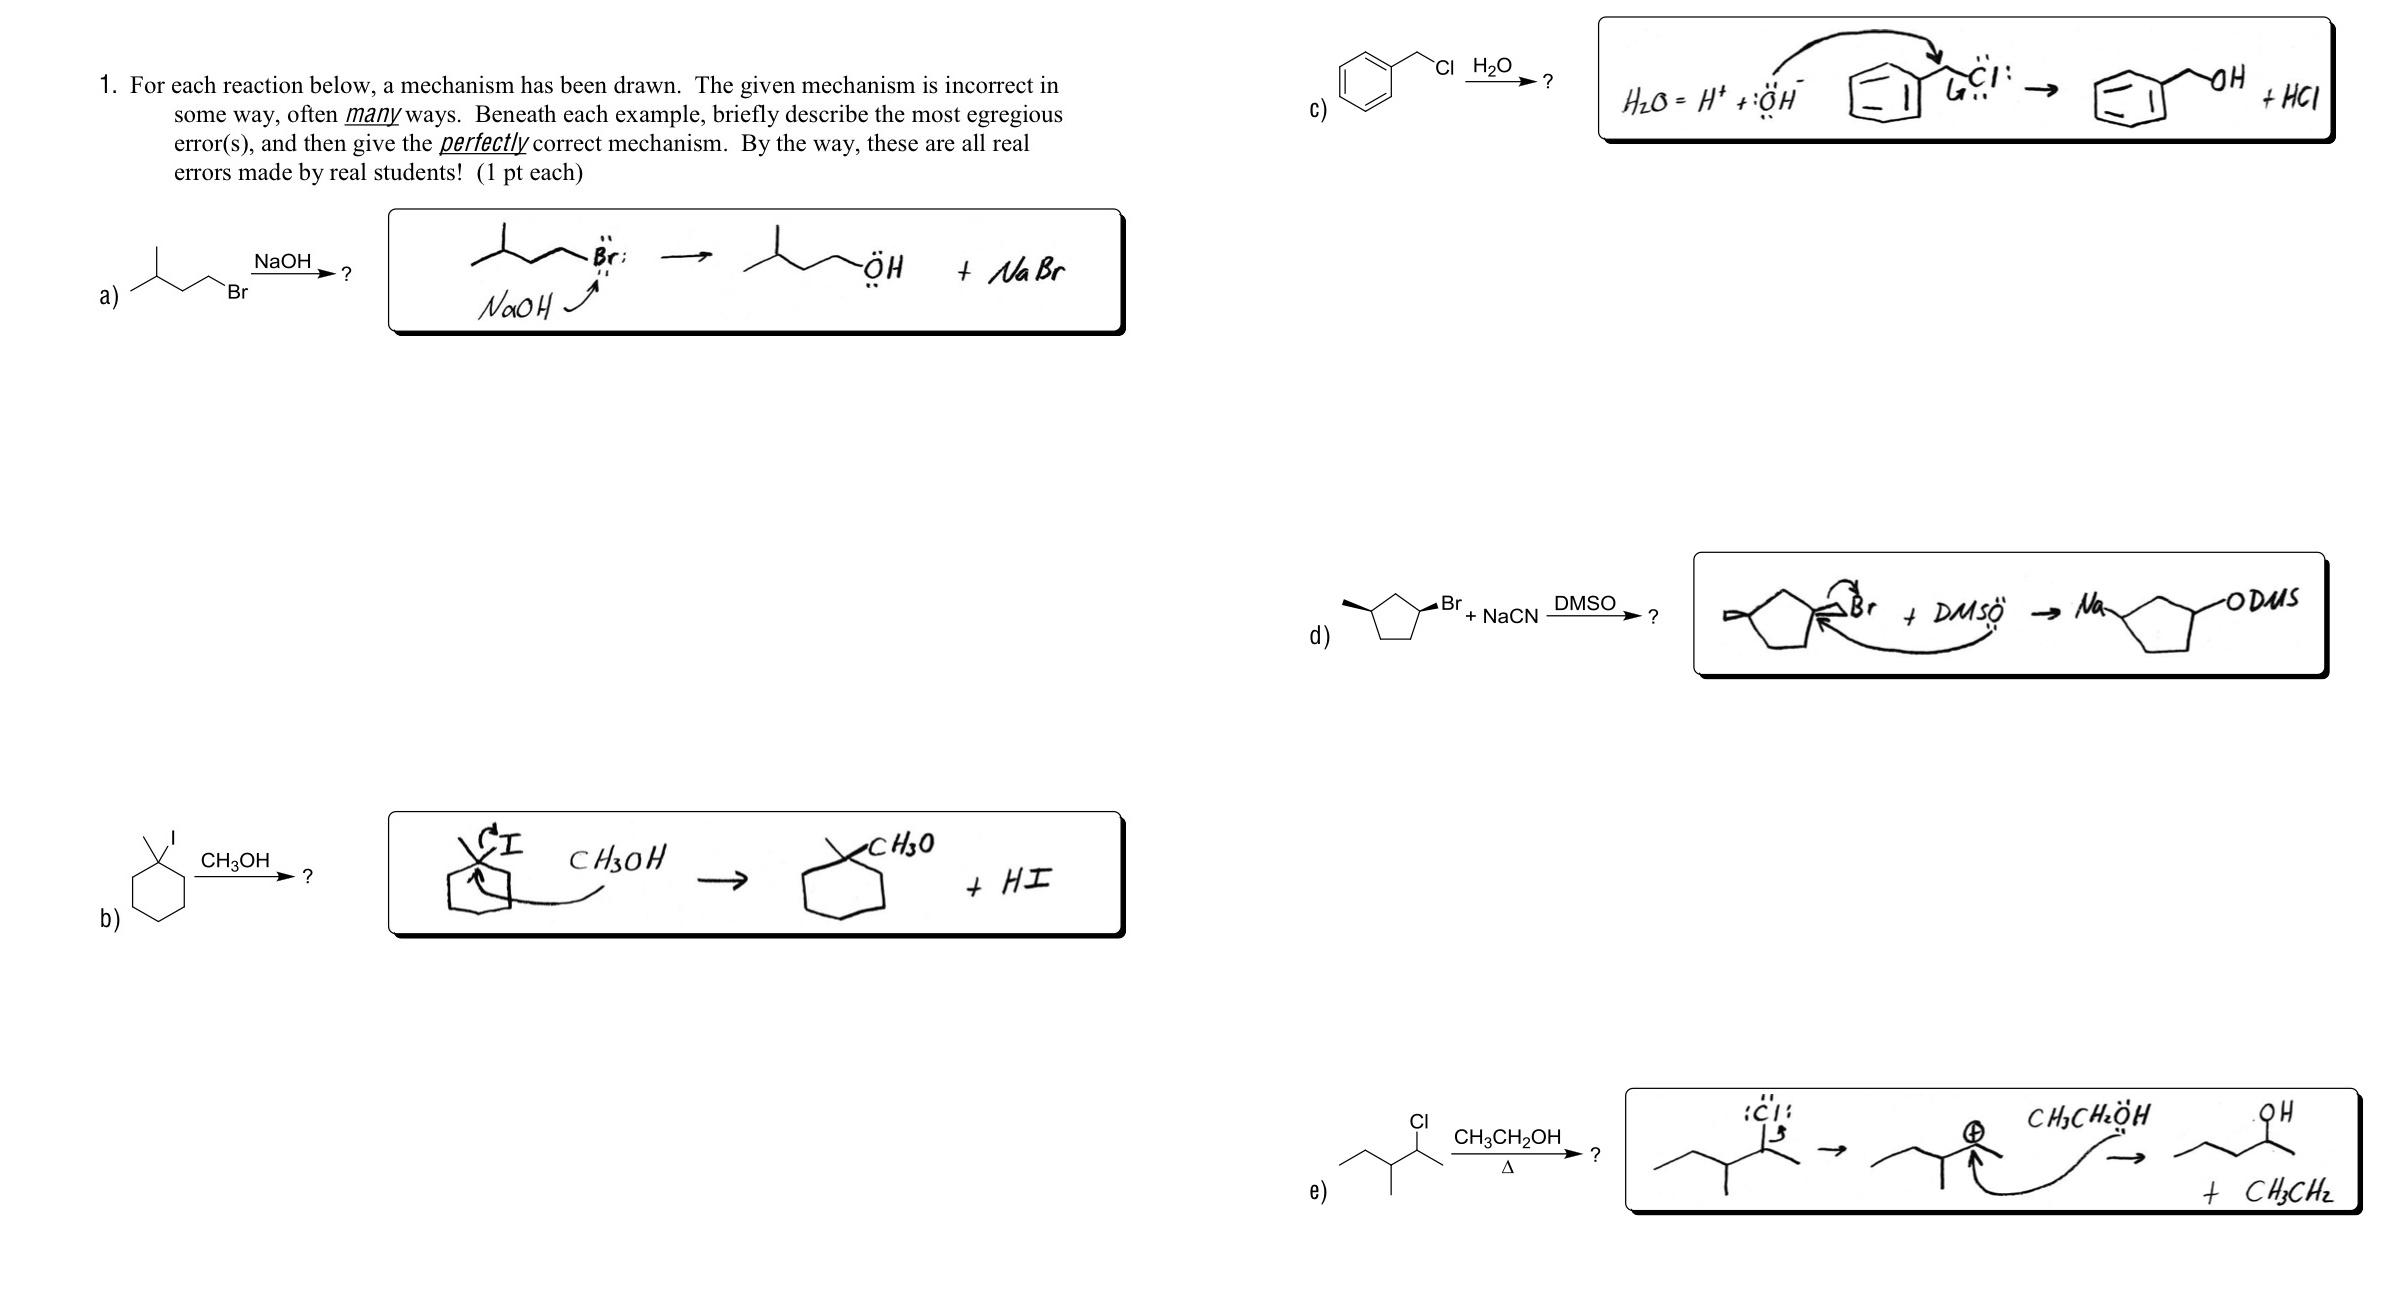 Chemistry archive october 30 2014 chegg com